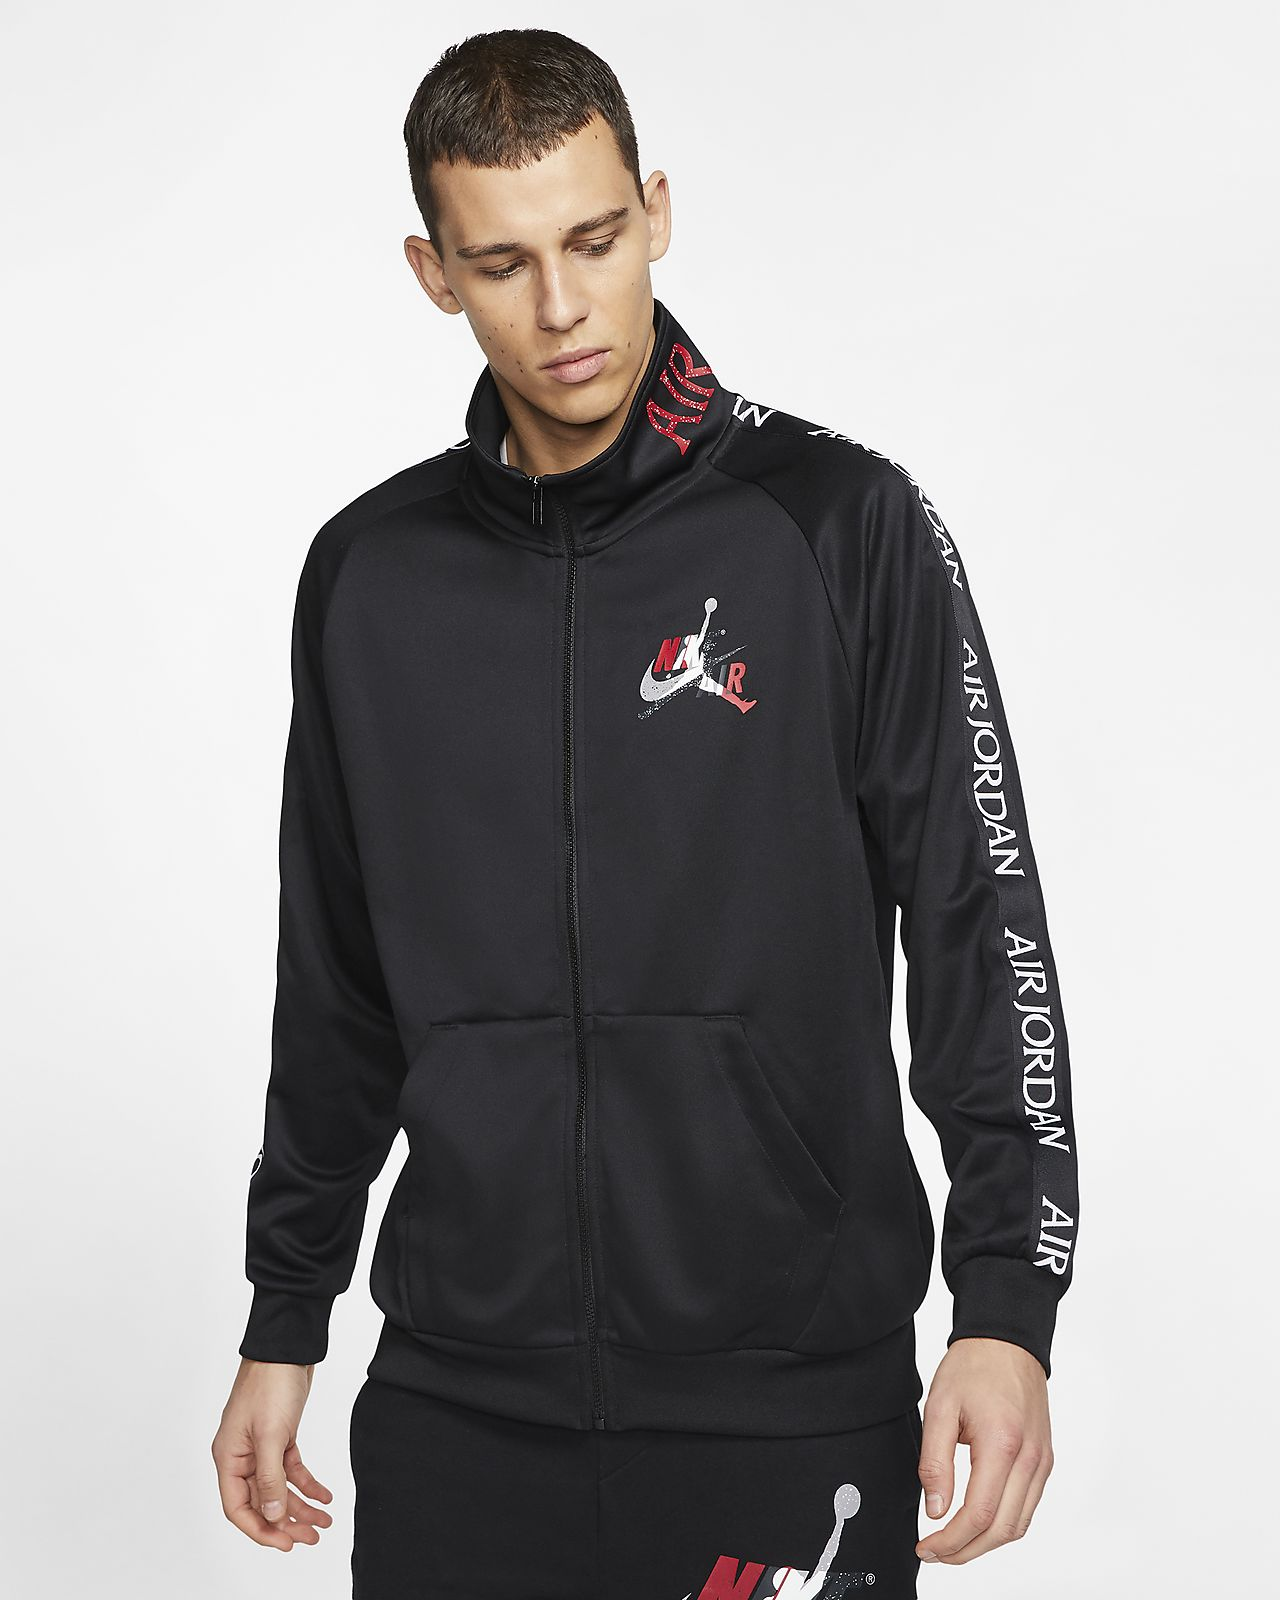 Tricot Warm-Up Jacket. Nike BG